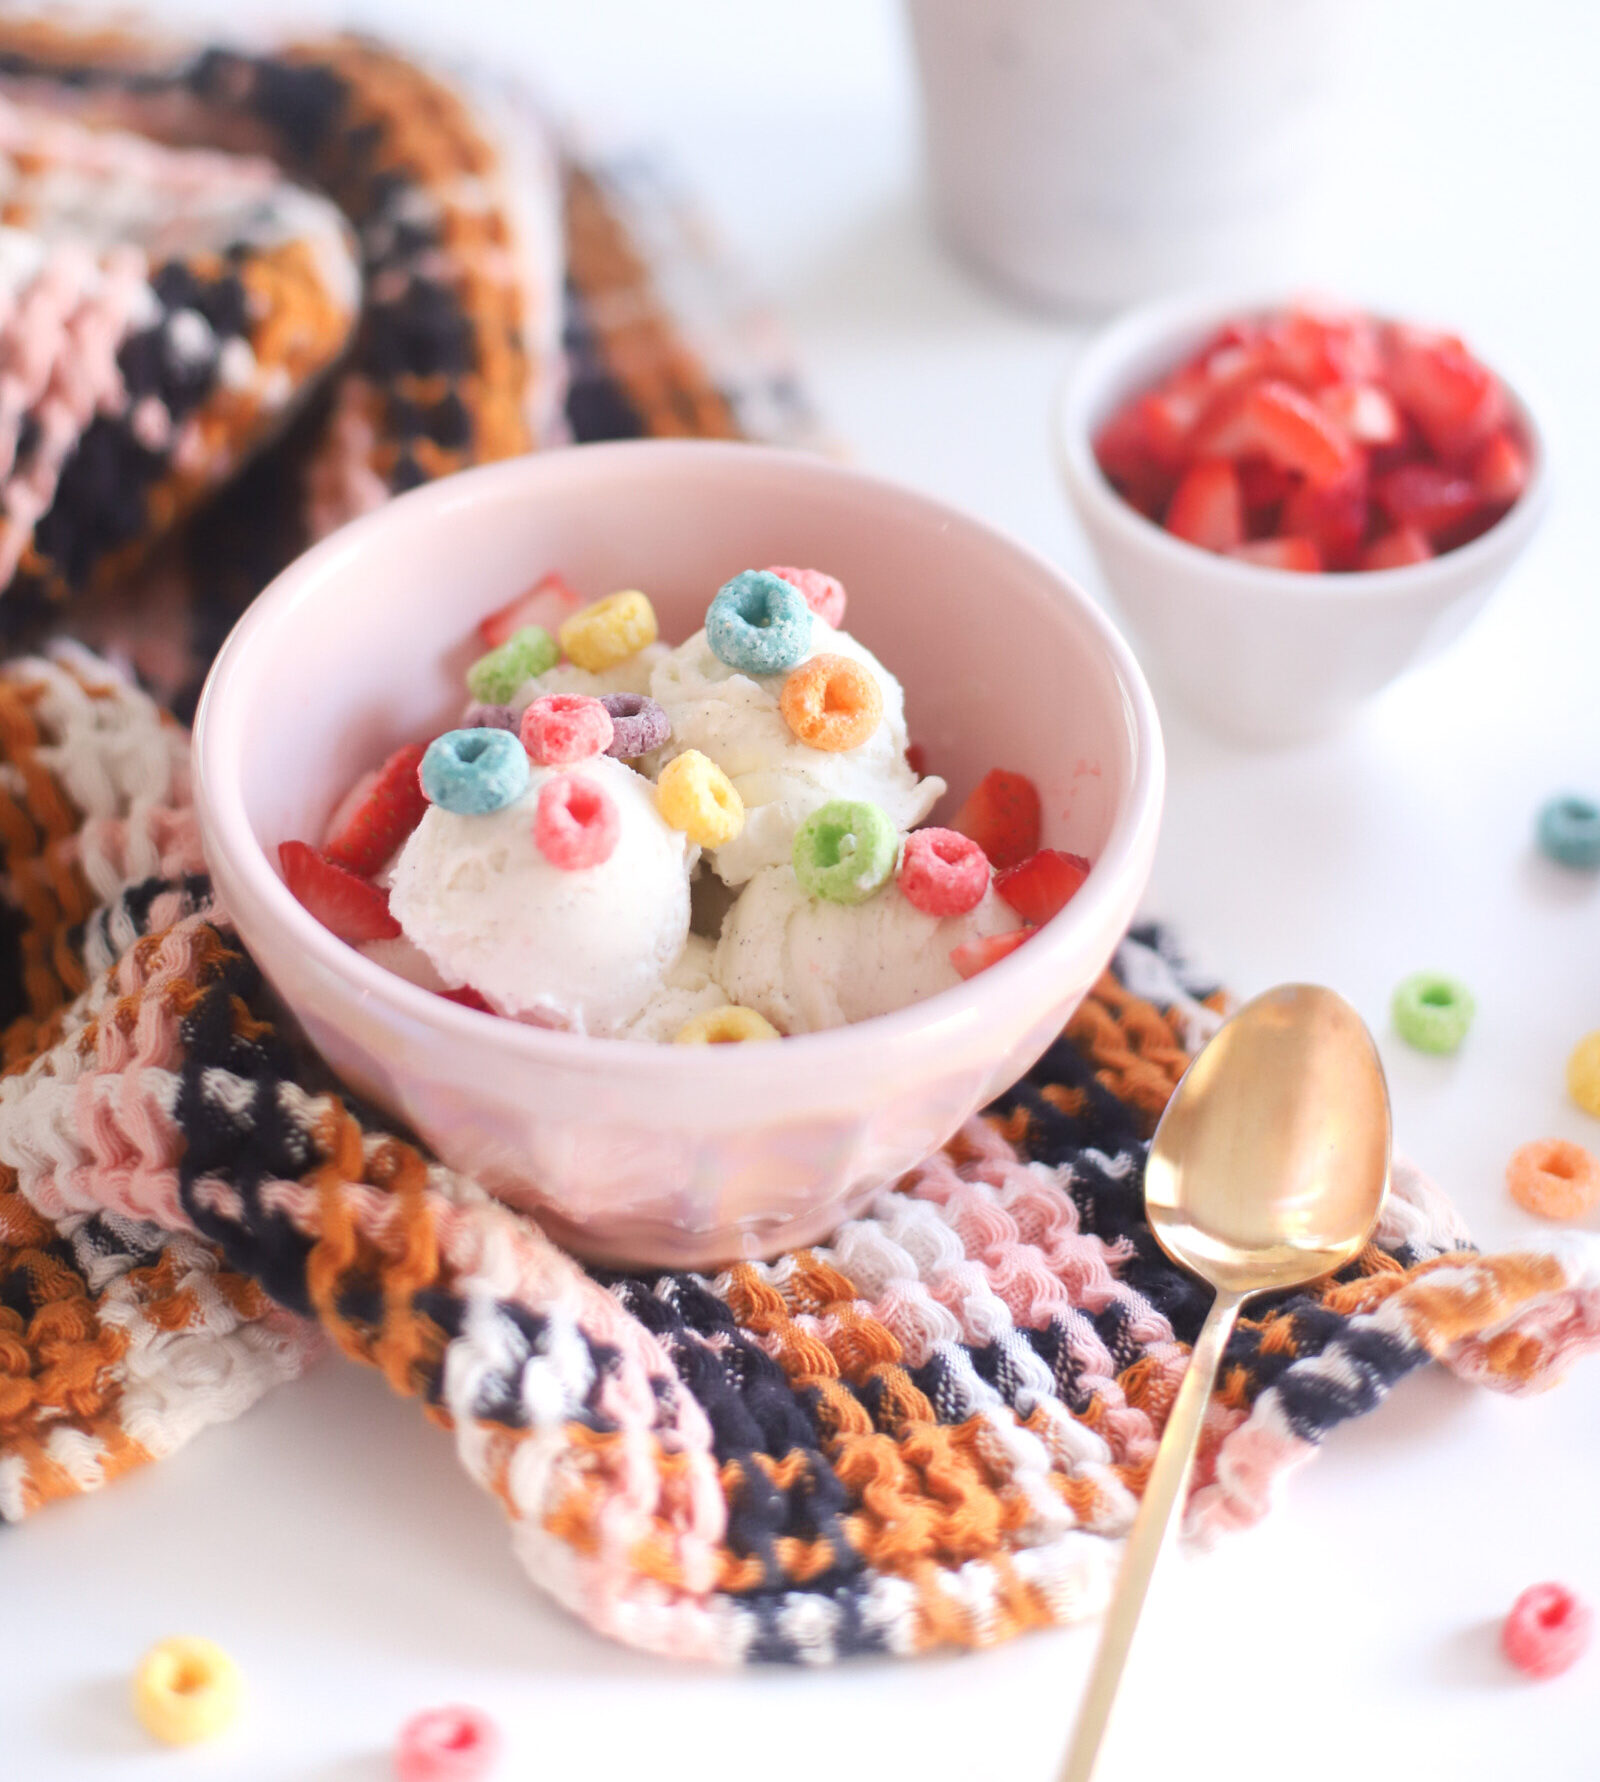 Create-Your-Own Ice Cream Treat Dessert Board